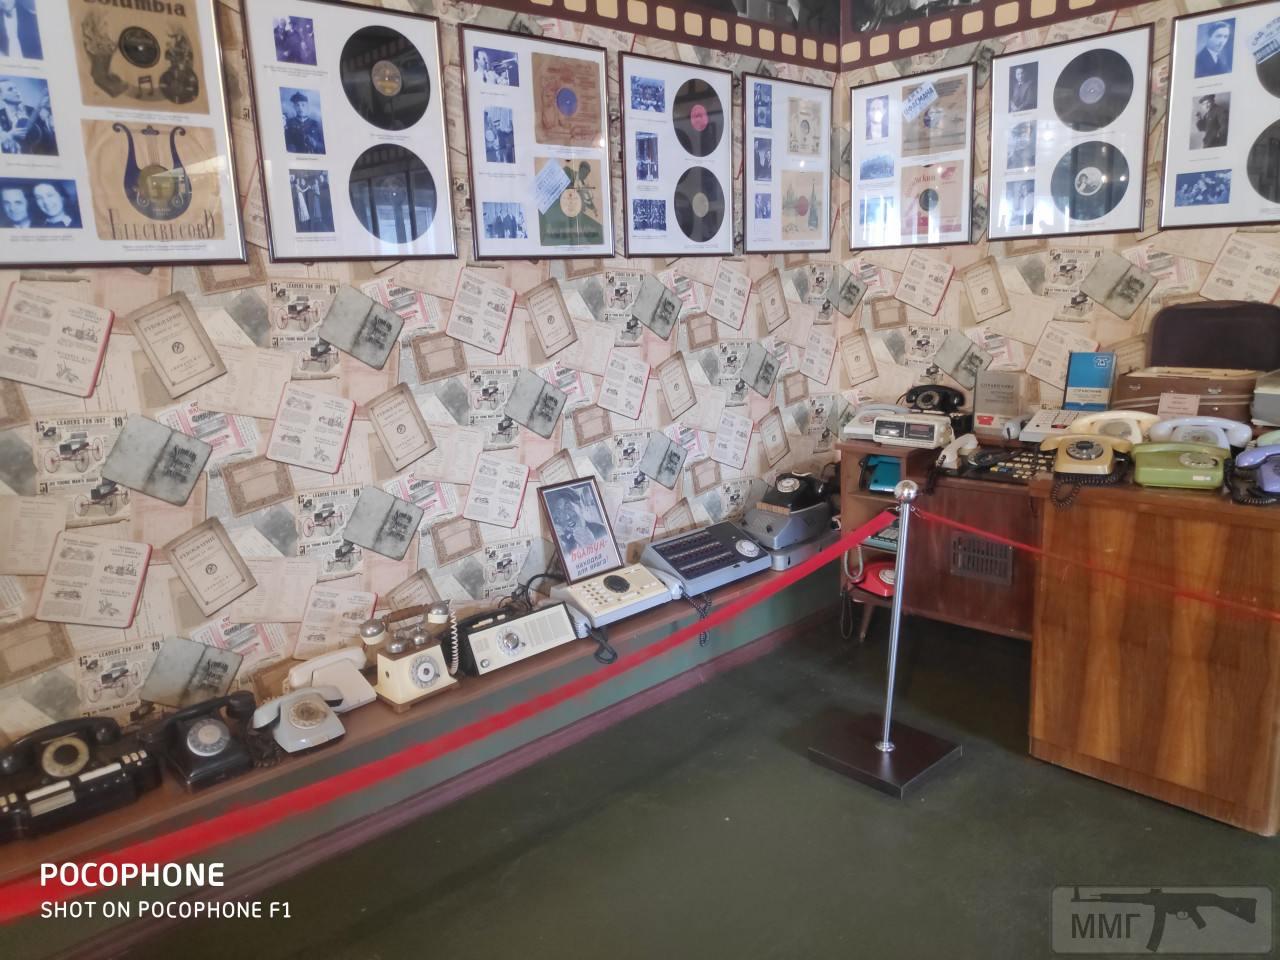 71135 - Музей техники Фаэтон в г. Запорожье